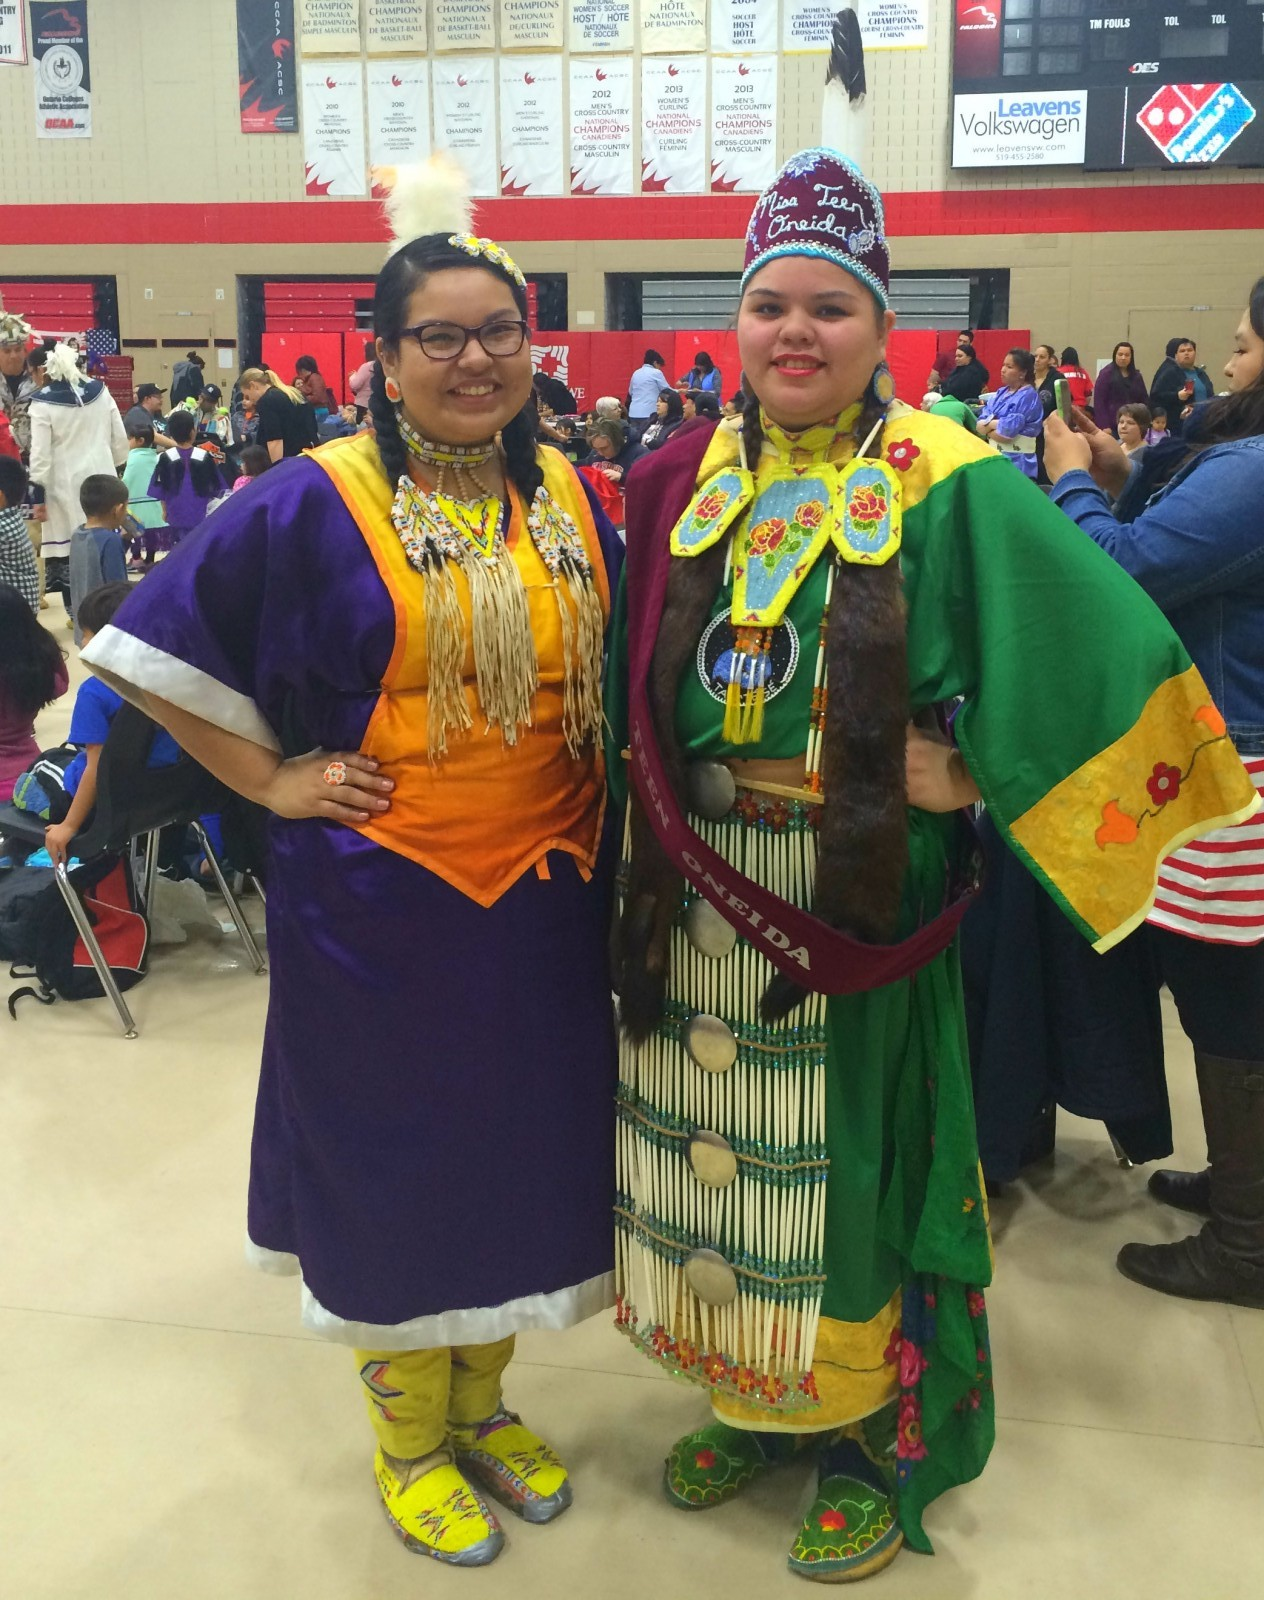 First Nation Celebration at Fanshawe College